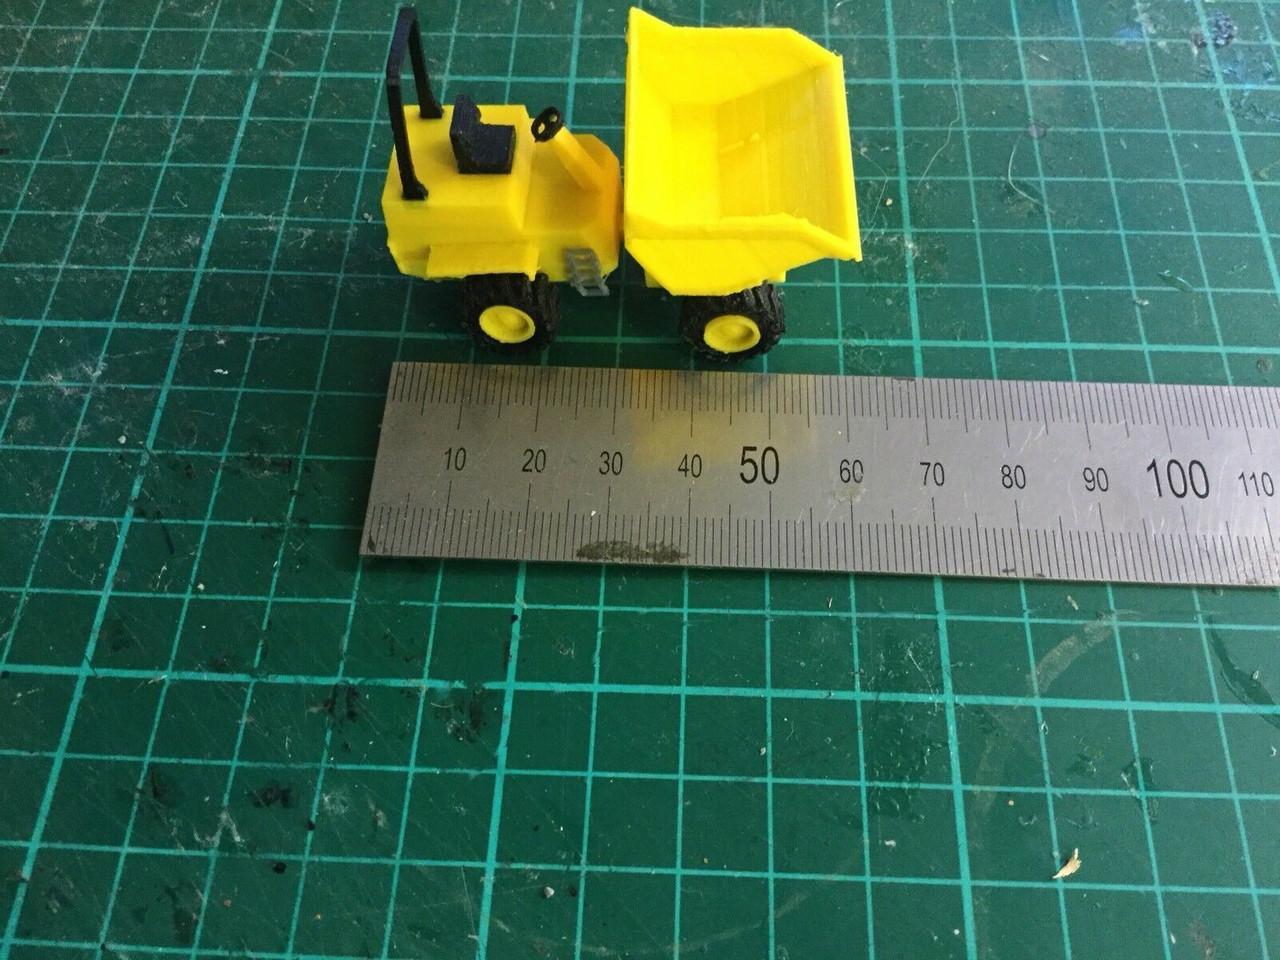 3D Printed  Articulated Dumper Truck ,Suit 1/76 scale & 00 Gauge.